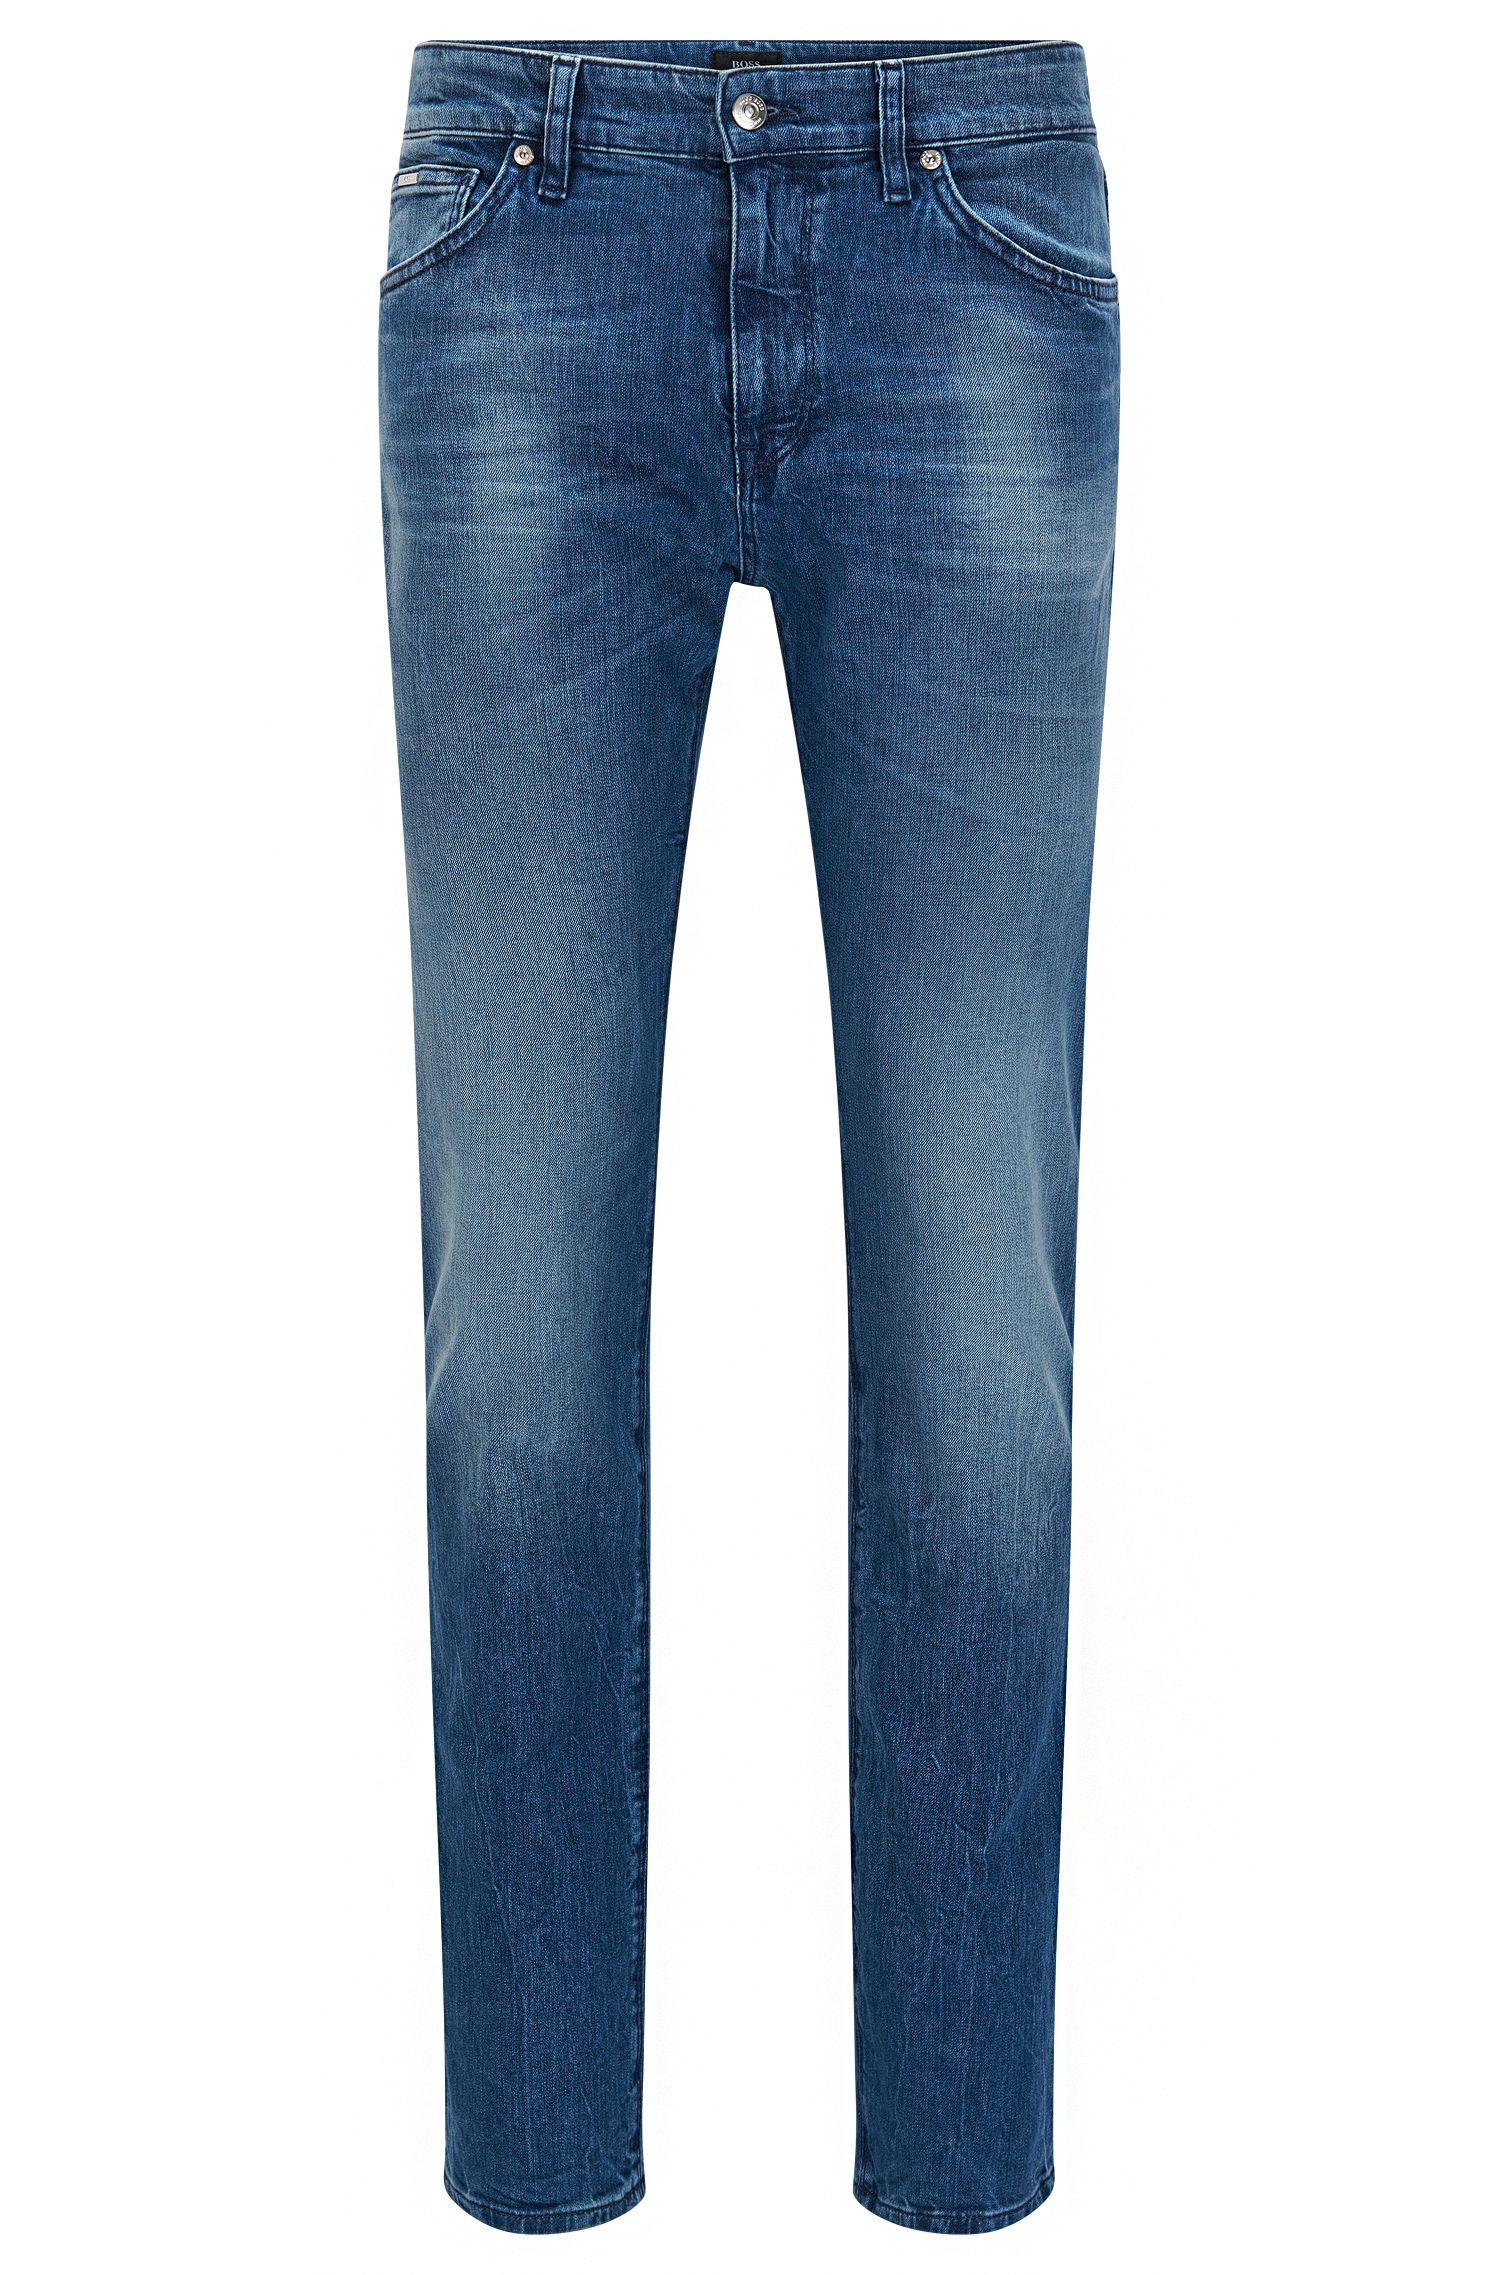 'Maine'   Regular Fit, 11 oz Stretch Cotton Jeans